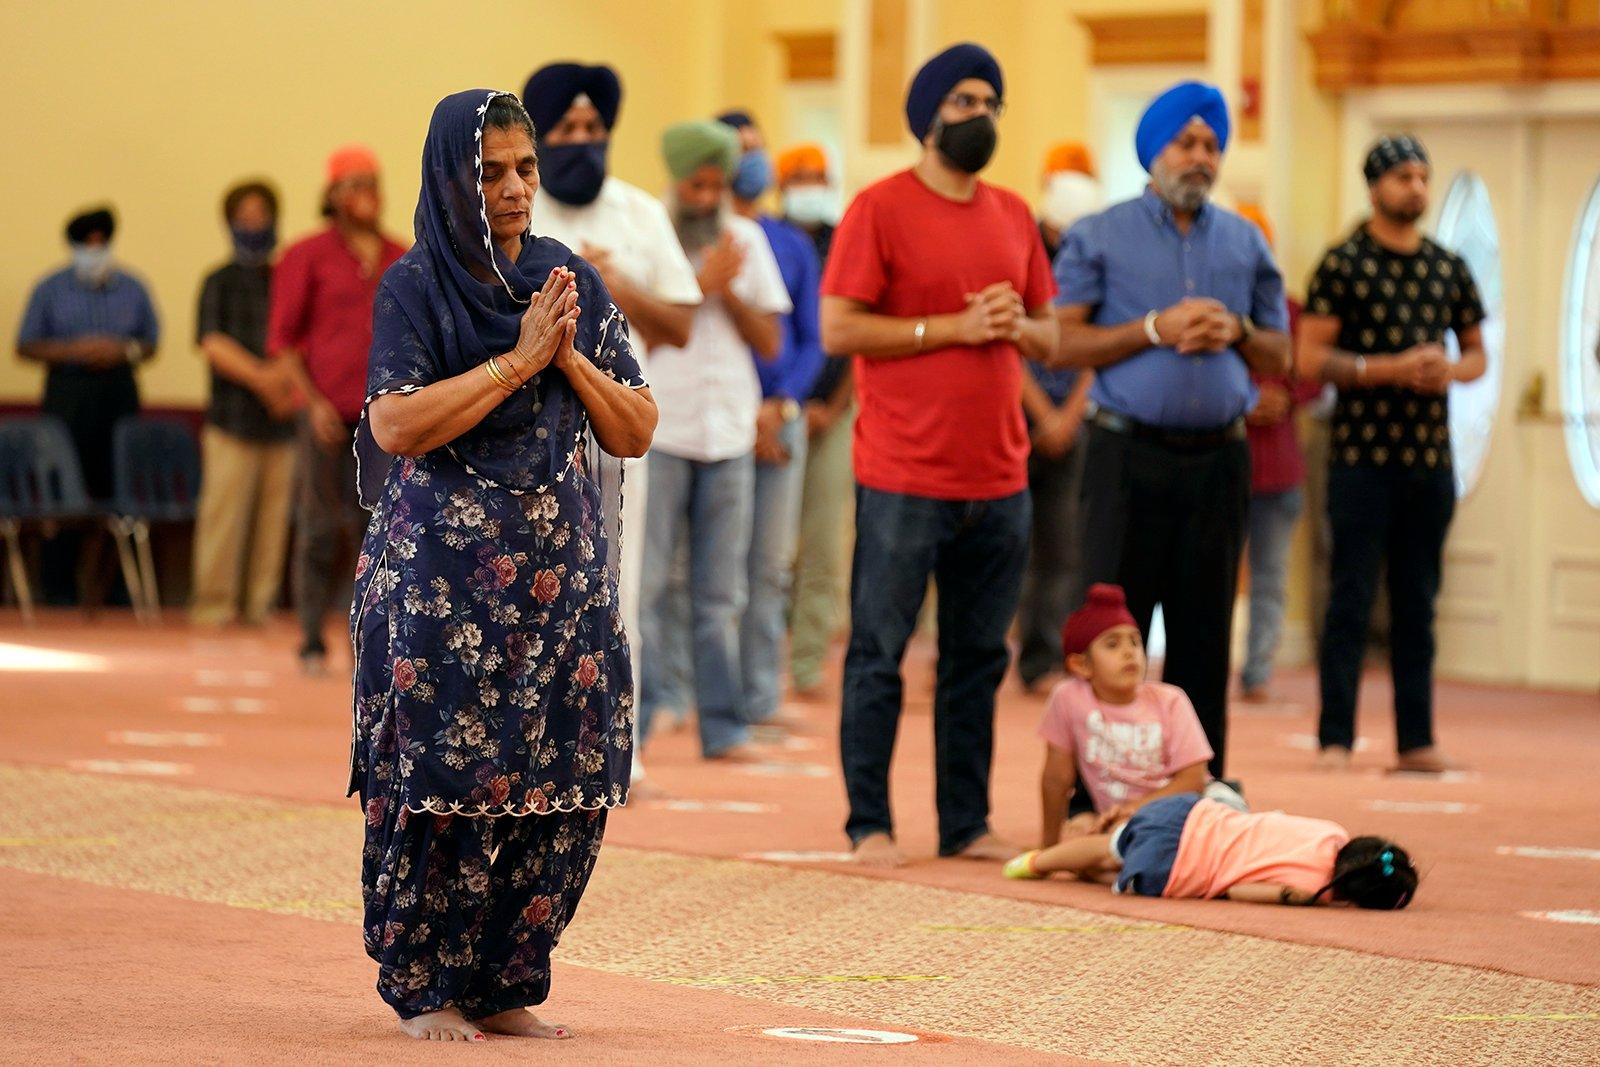 Sikhs participate in a worship service at a gurdwara in Glen Rock, N.J., Sunday, Aug. 15, 2021. (AP Photo/Seth Wenig)